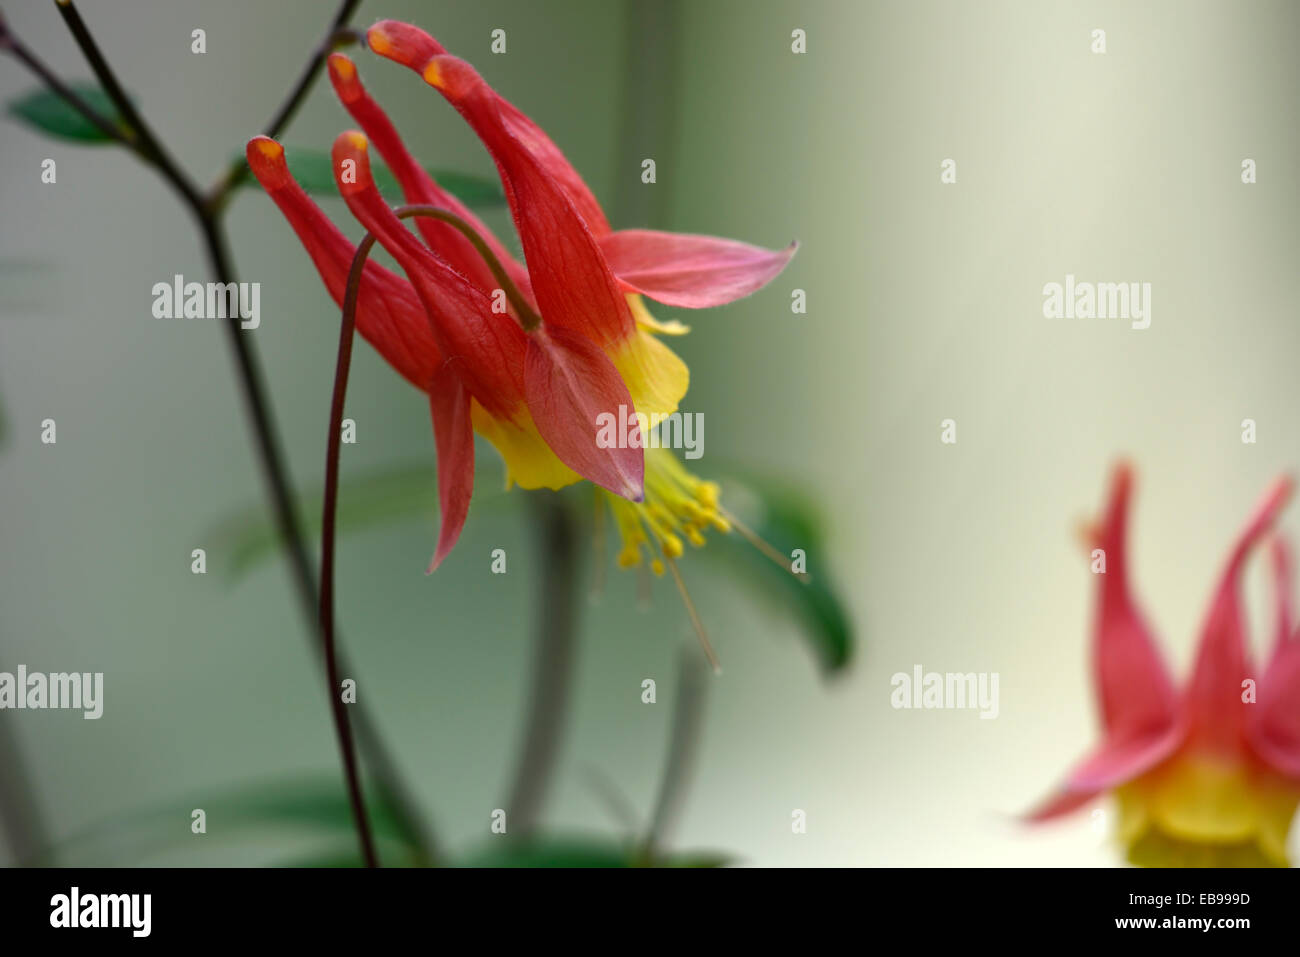 Aquilegia canadensis wild canadian columbine red yellow flower stock aquilegia canadensis wild canadian columbine red yellow flower flowering perennial rm floral mightylinksfo